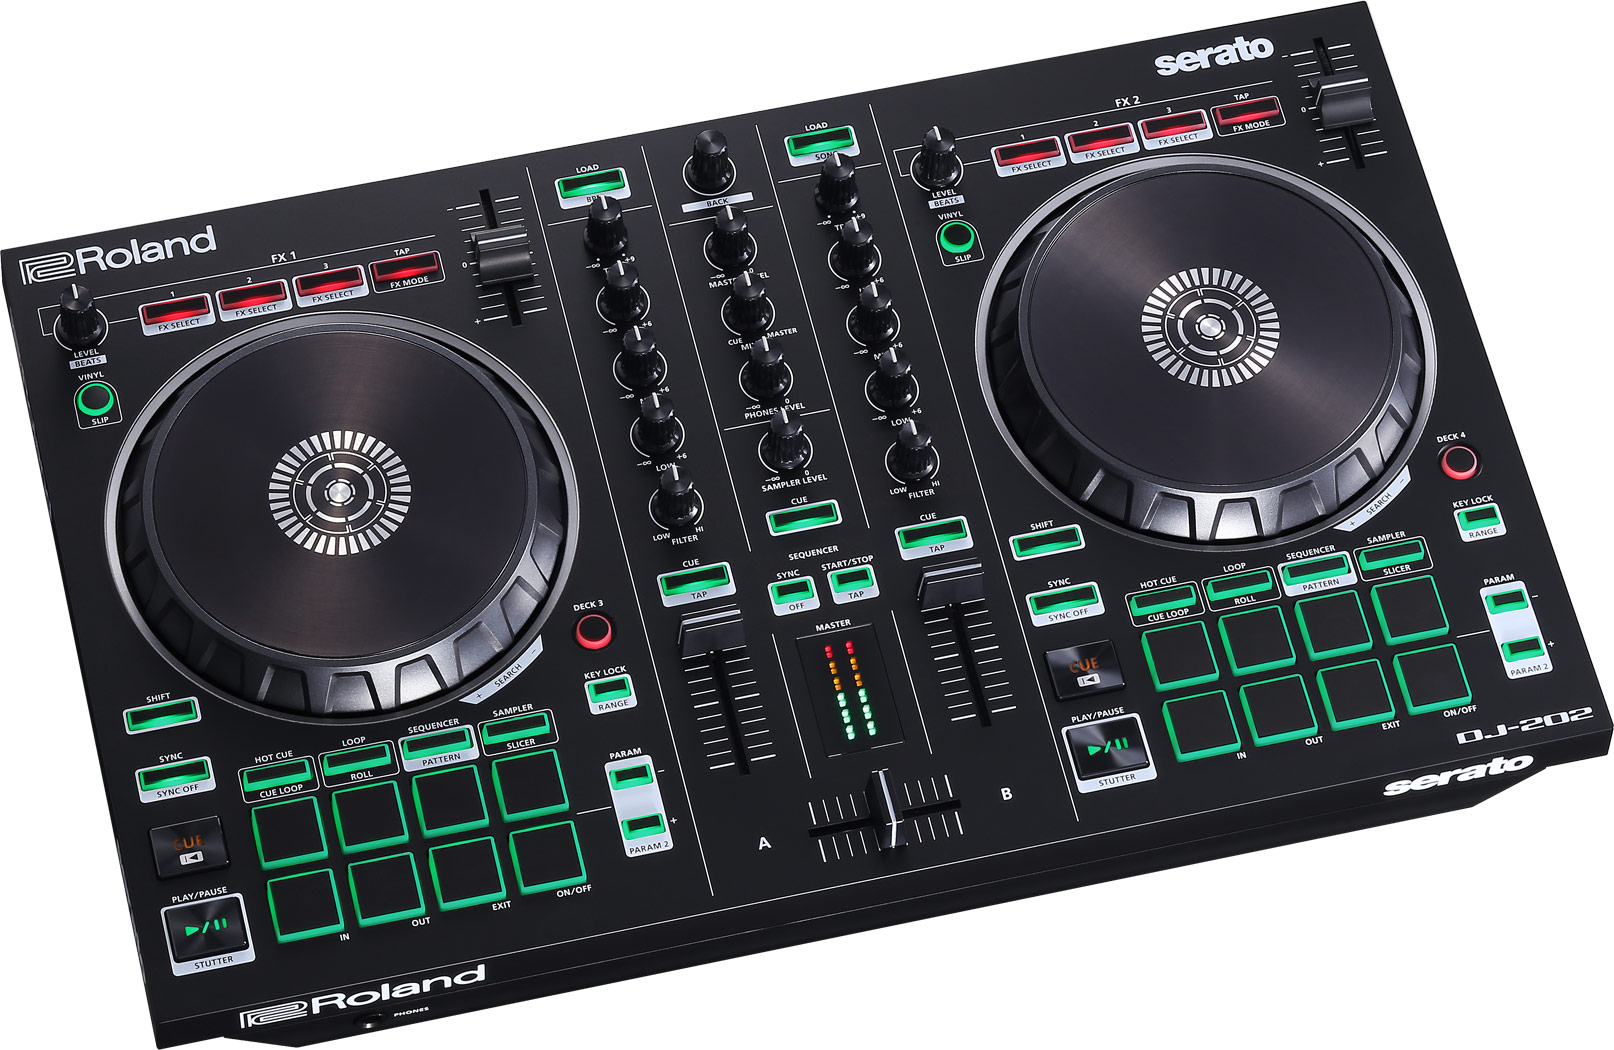 ROLAND-DJ-202-419441-sku-45362049